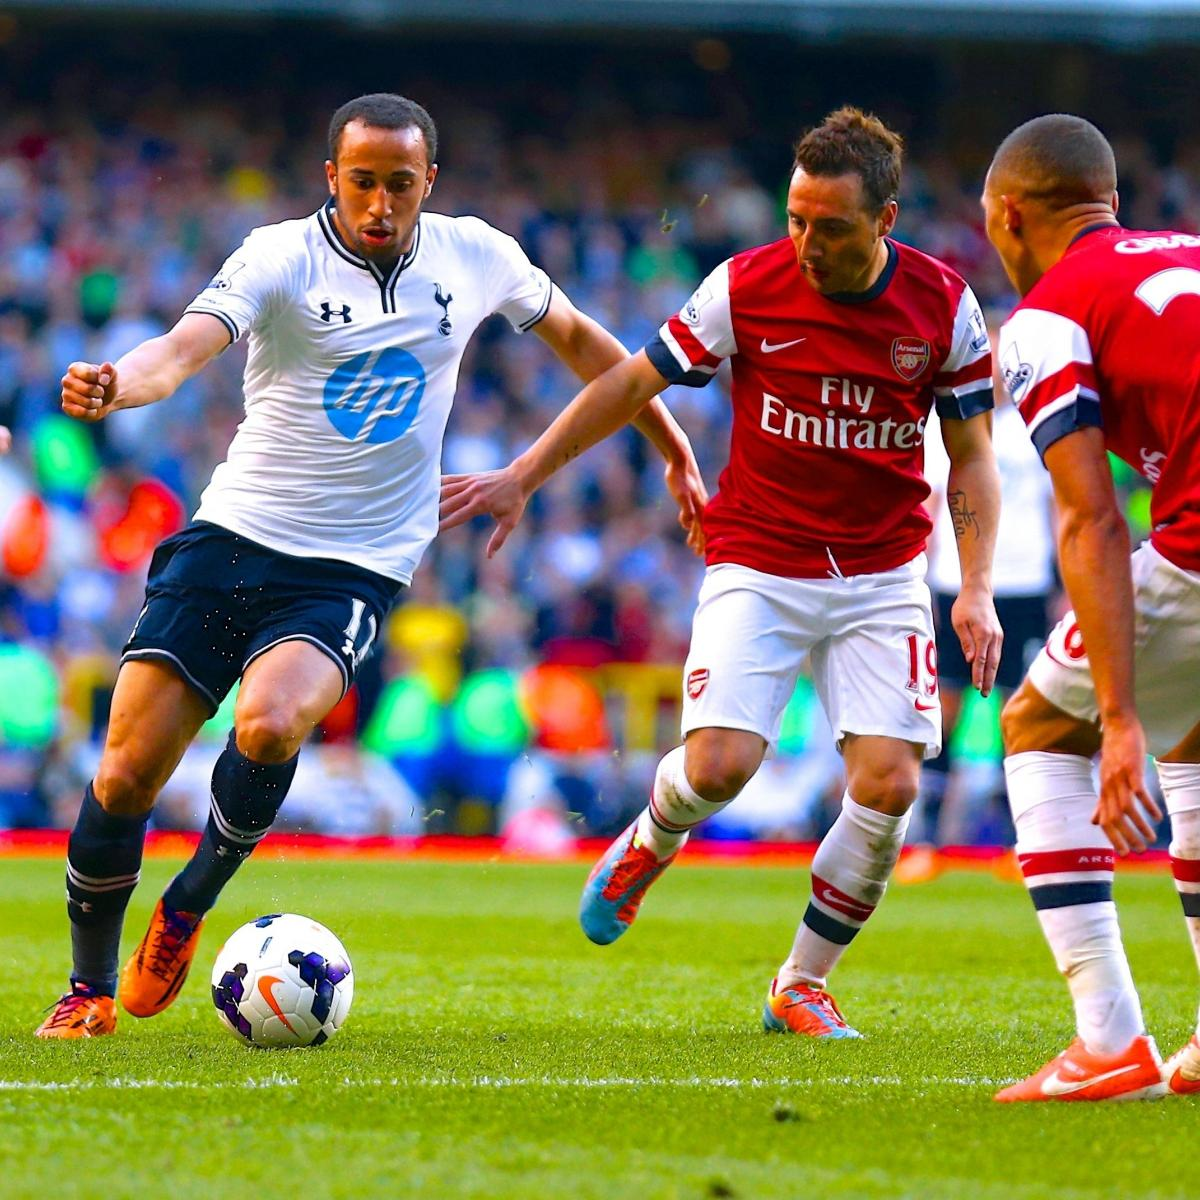 Arsenal Vs Tottenham Live Score Highlights From Premier: Arsenal Vs. Tottenham And The 25 Fiercest Rivalries In